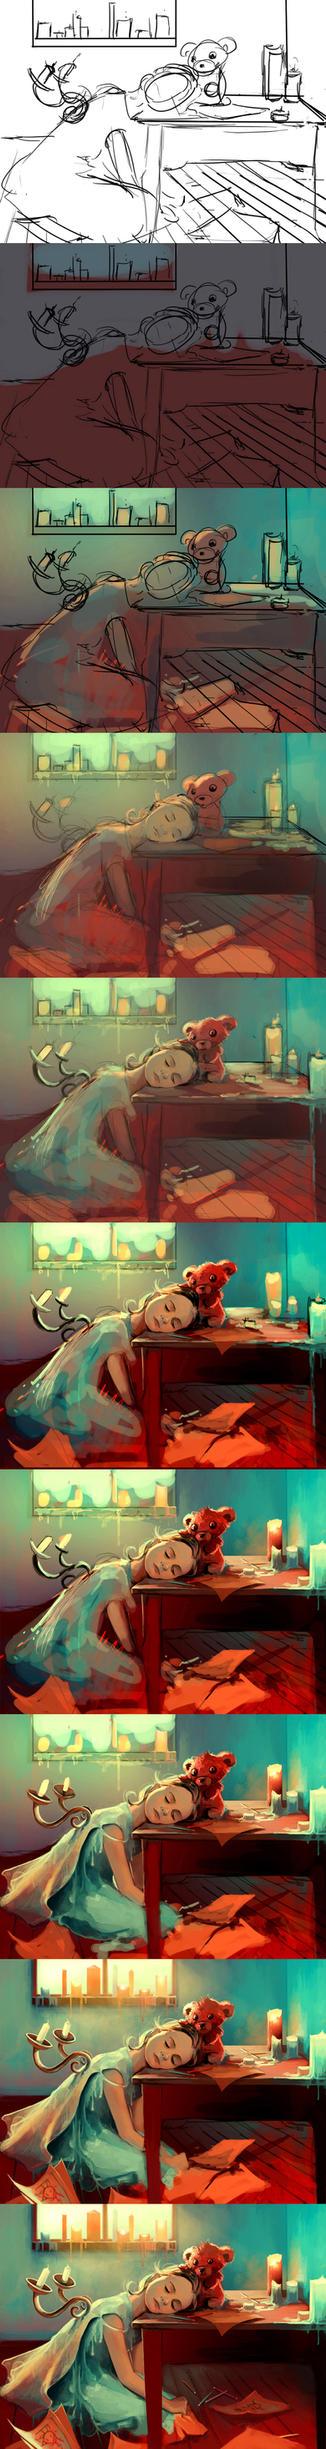 WIP when she was six by AquaSixio